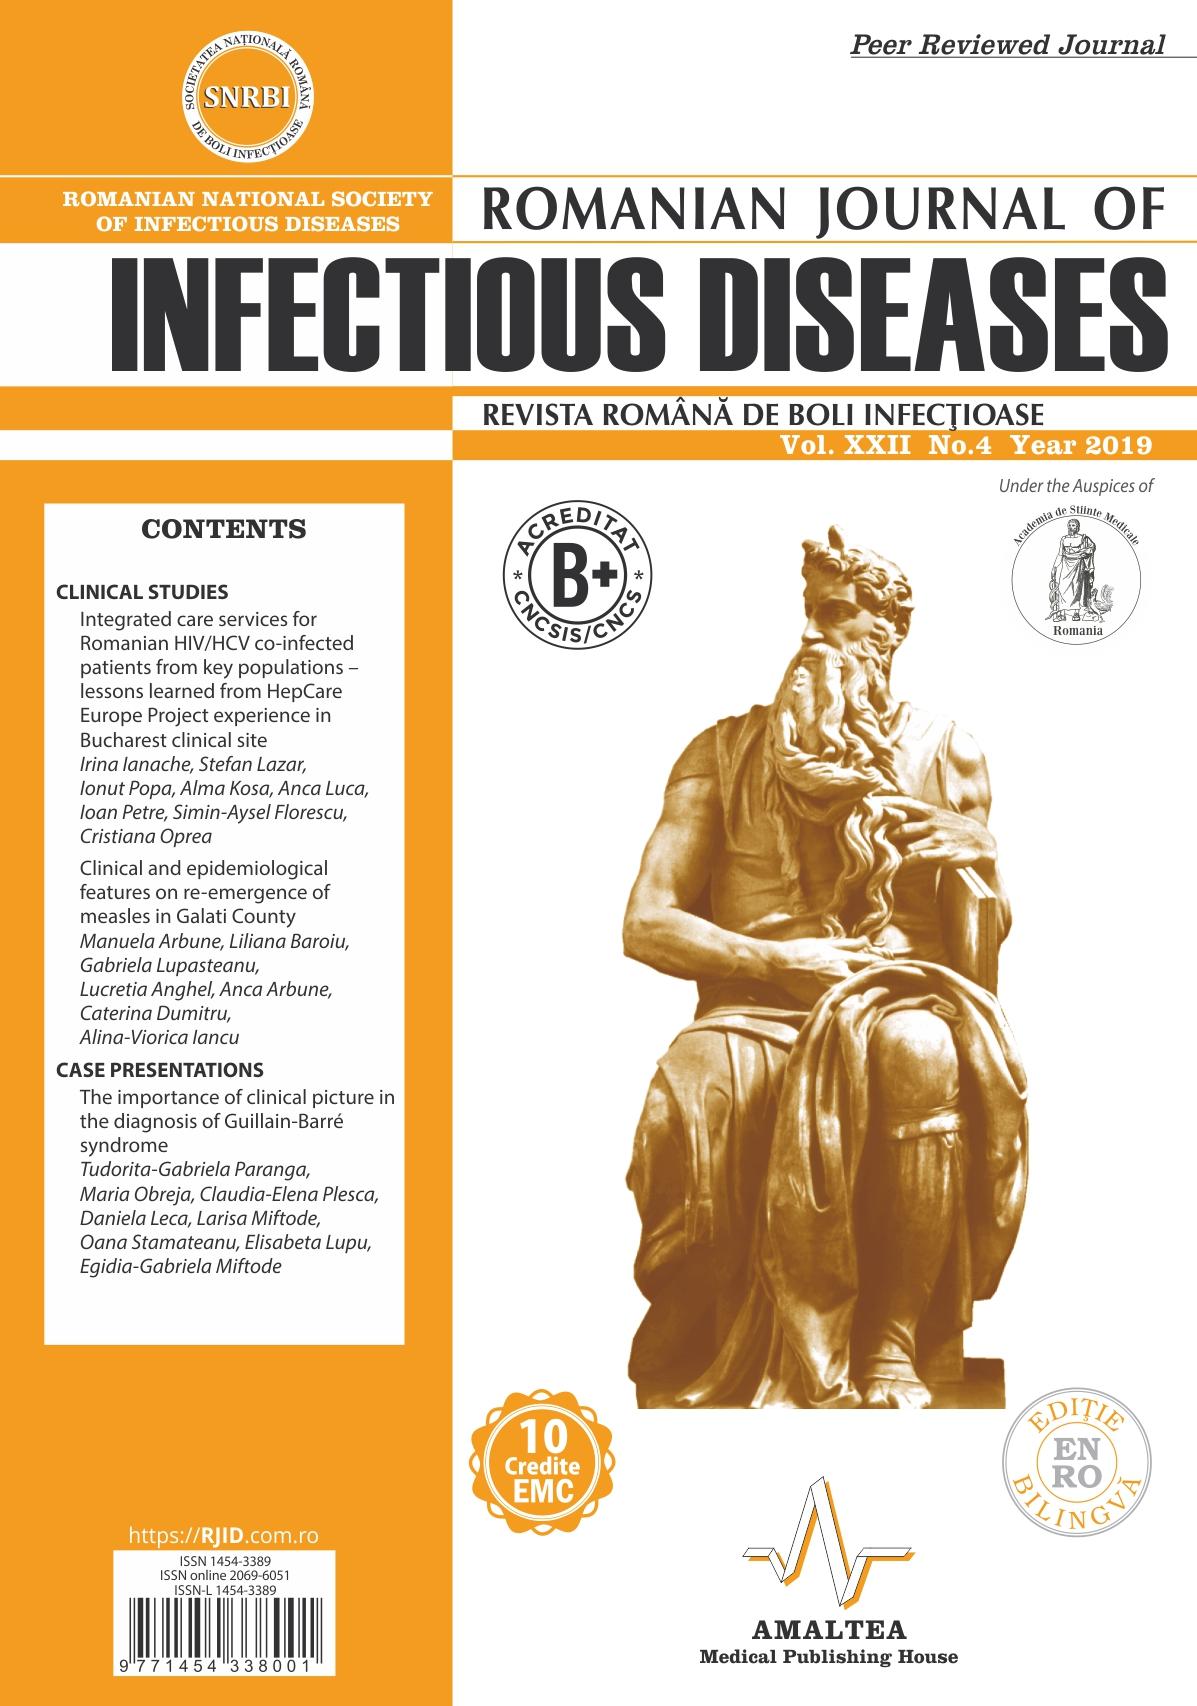 Revista Romana de Boli Infectioase | Vol. XXII, No. 4, 2019